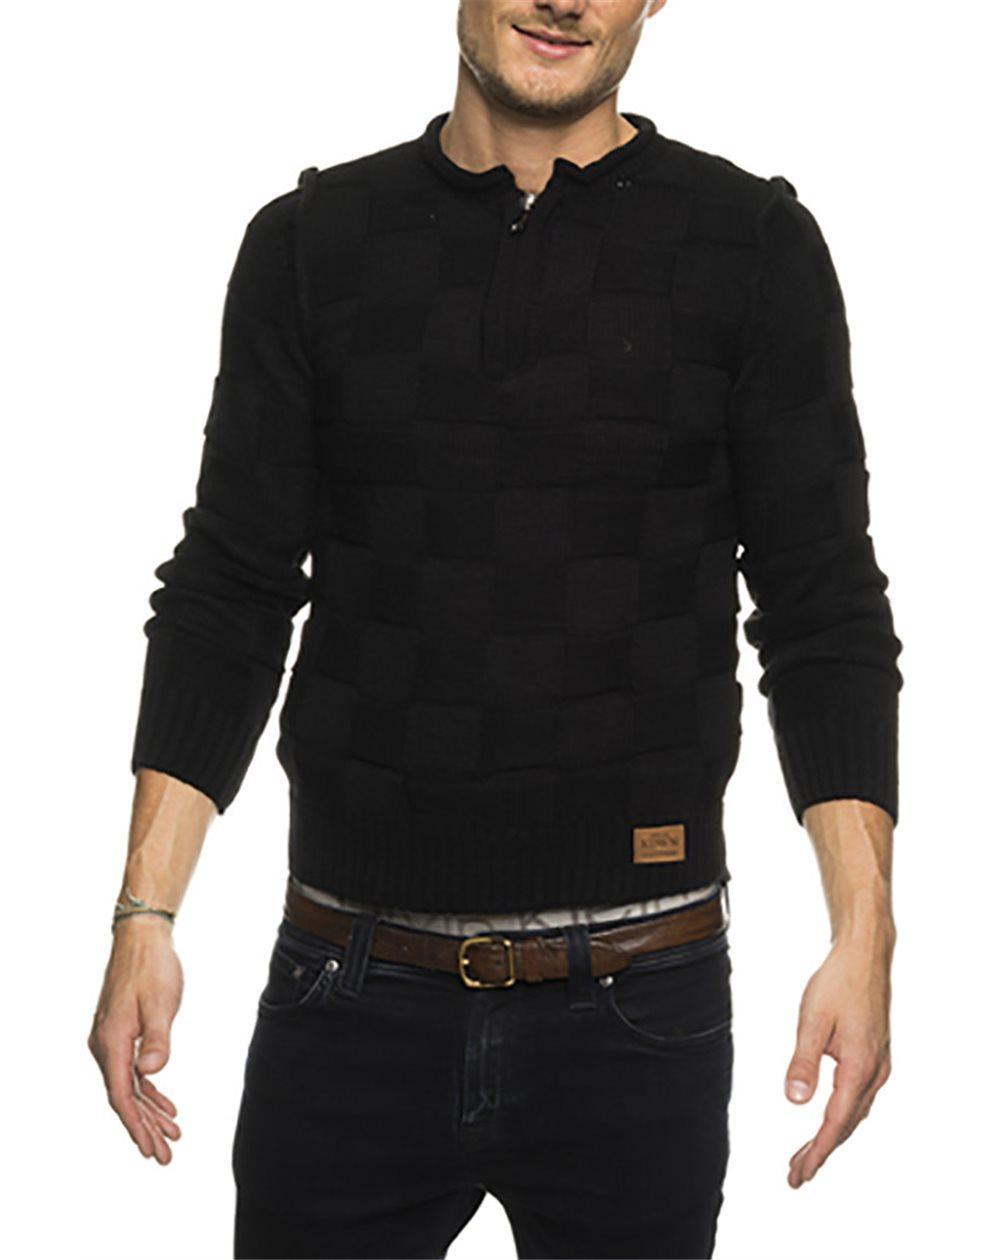 Subliminal Mode - Pull homme col arrondi avec bouton grosse maille KD6060